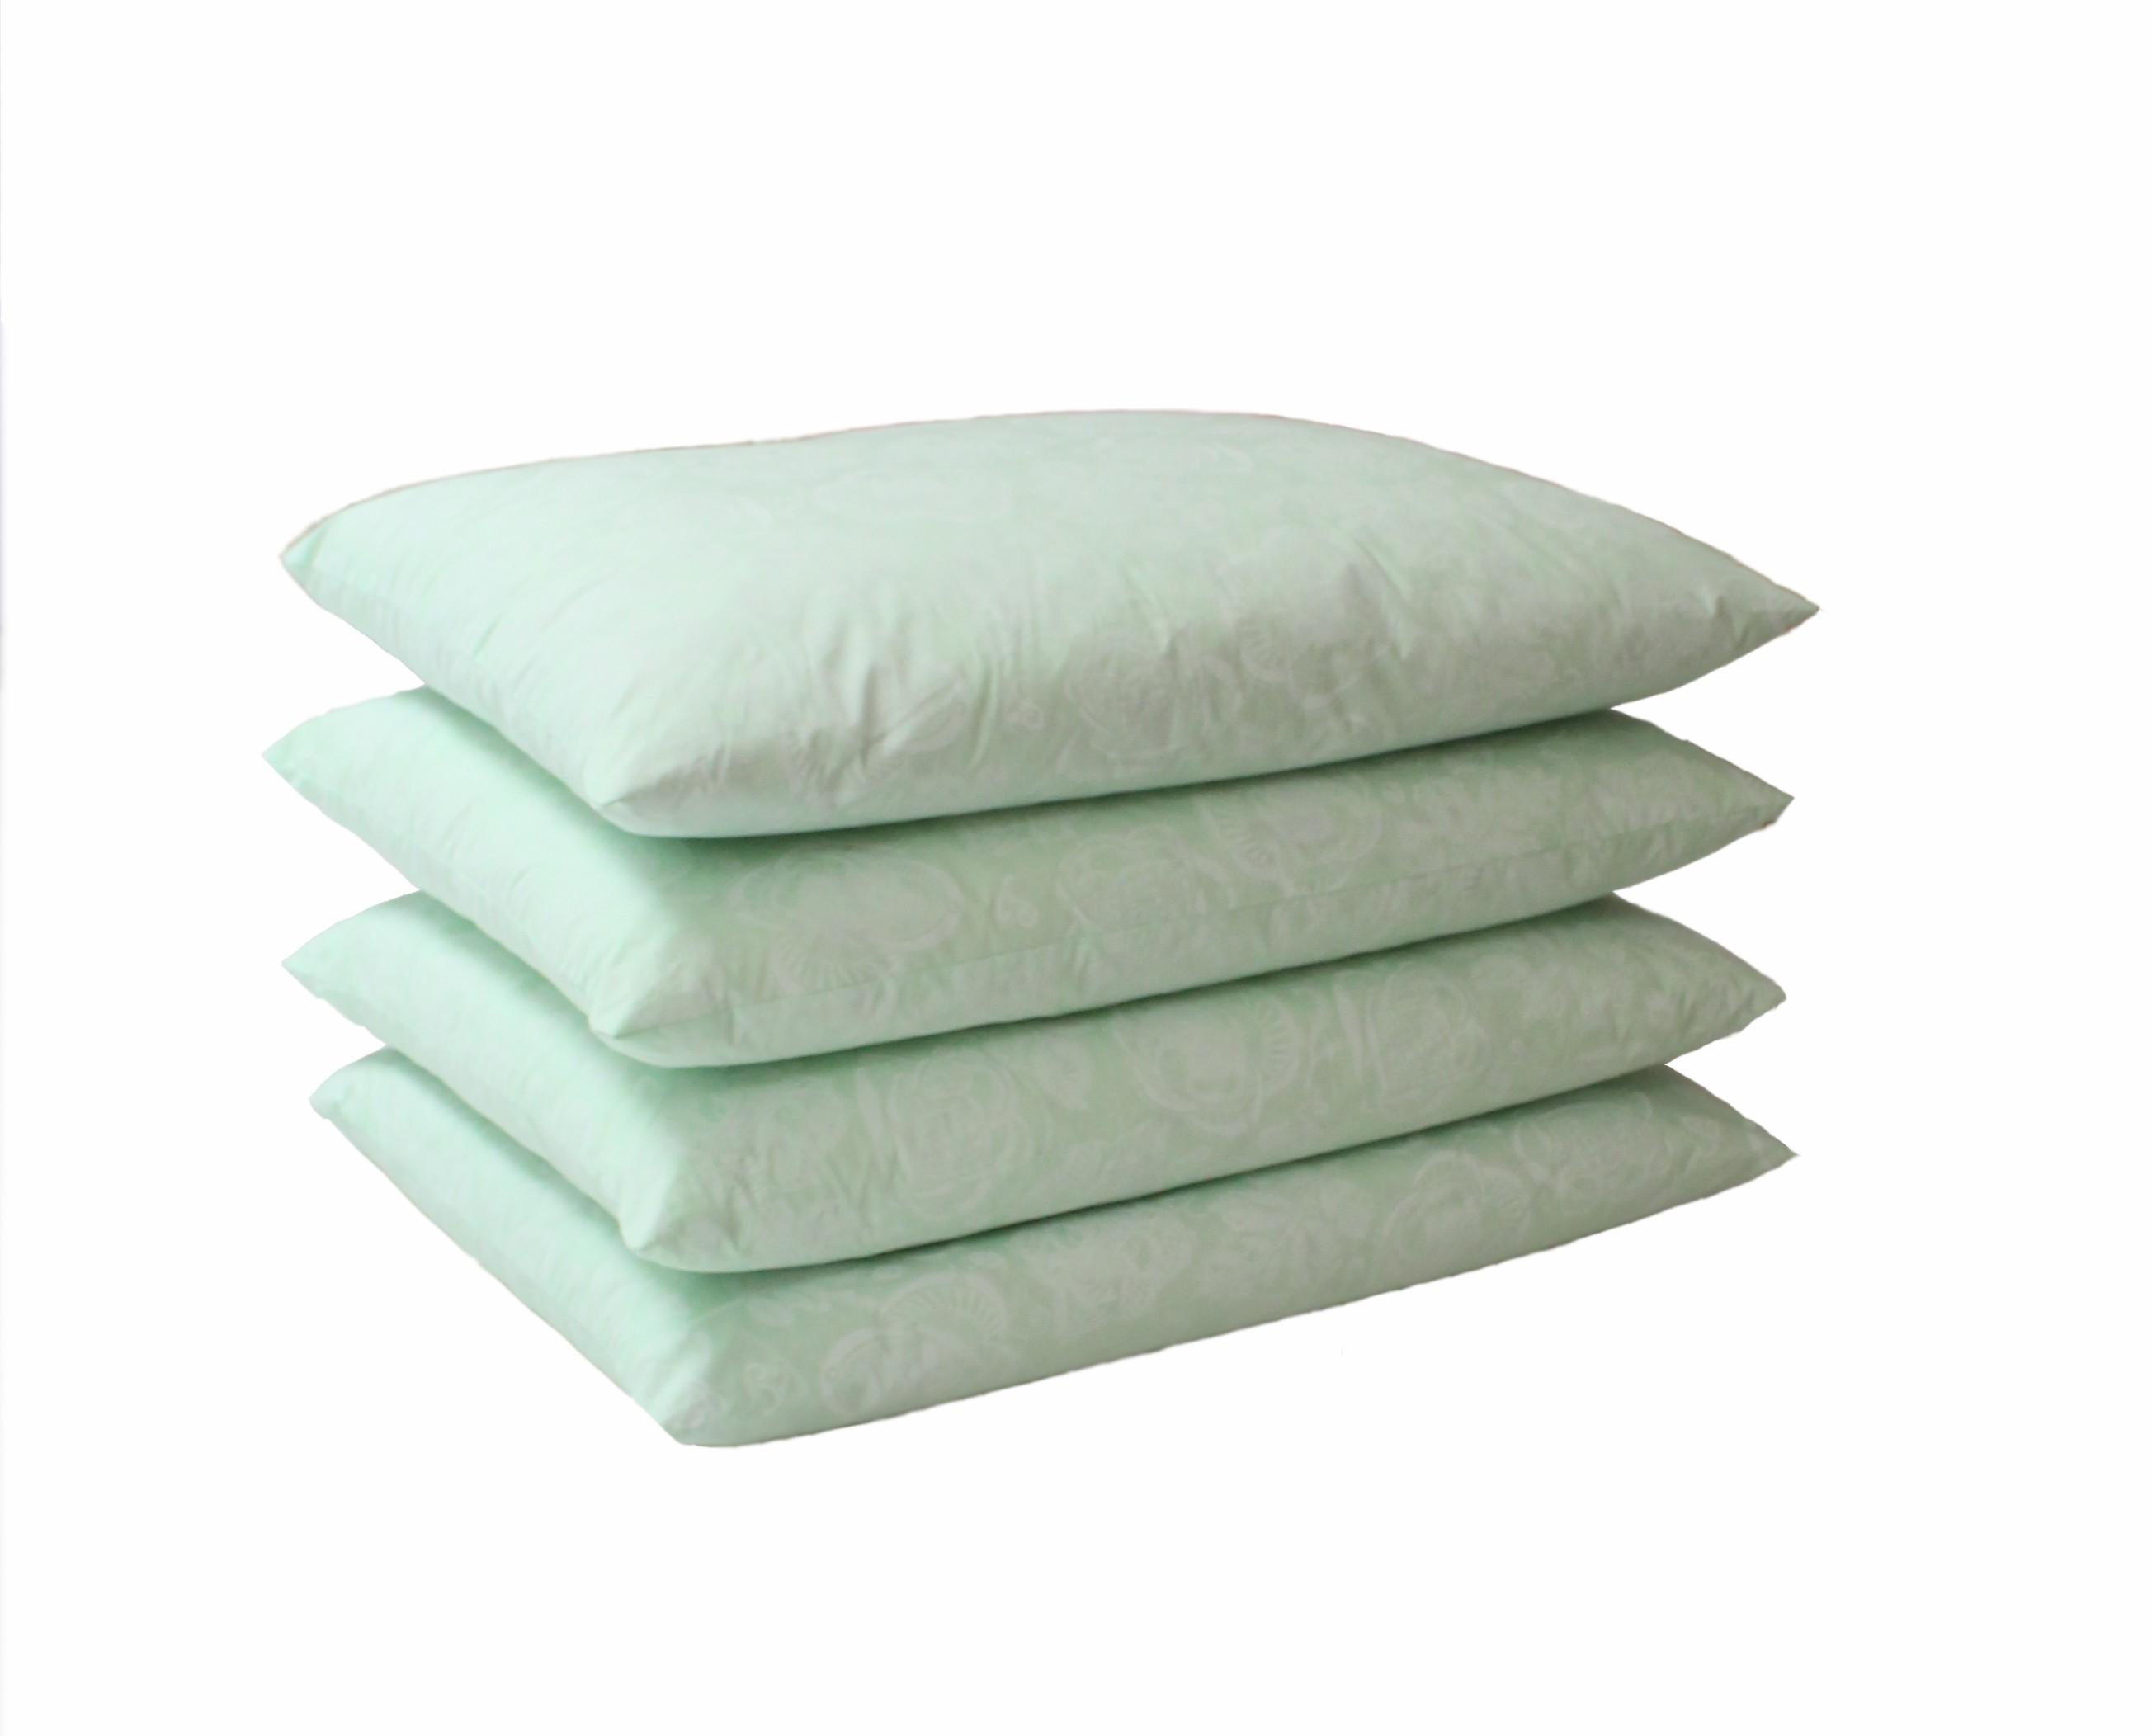 Slavonski jastuk 3+1 gratis!